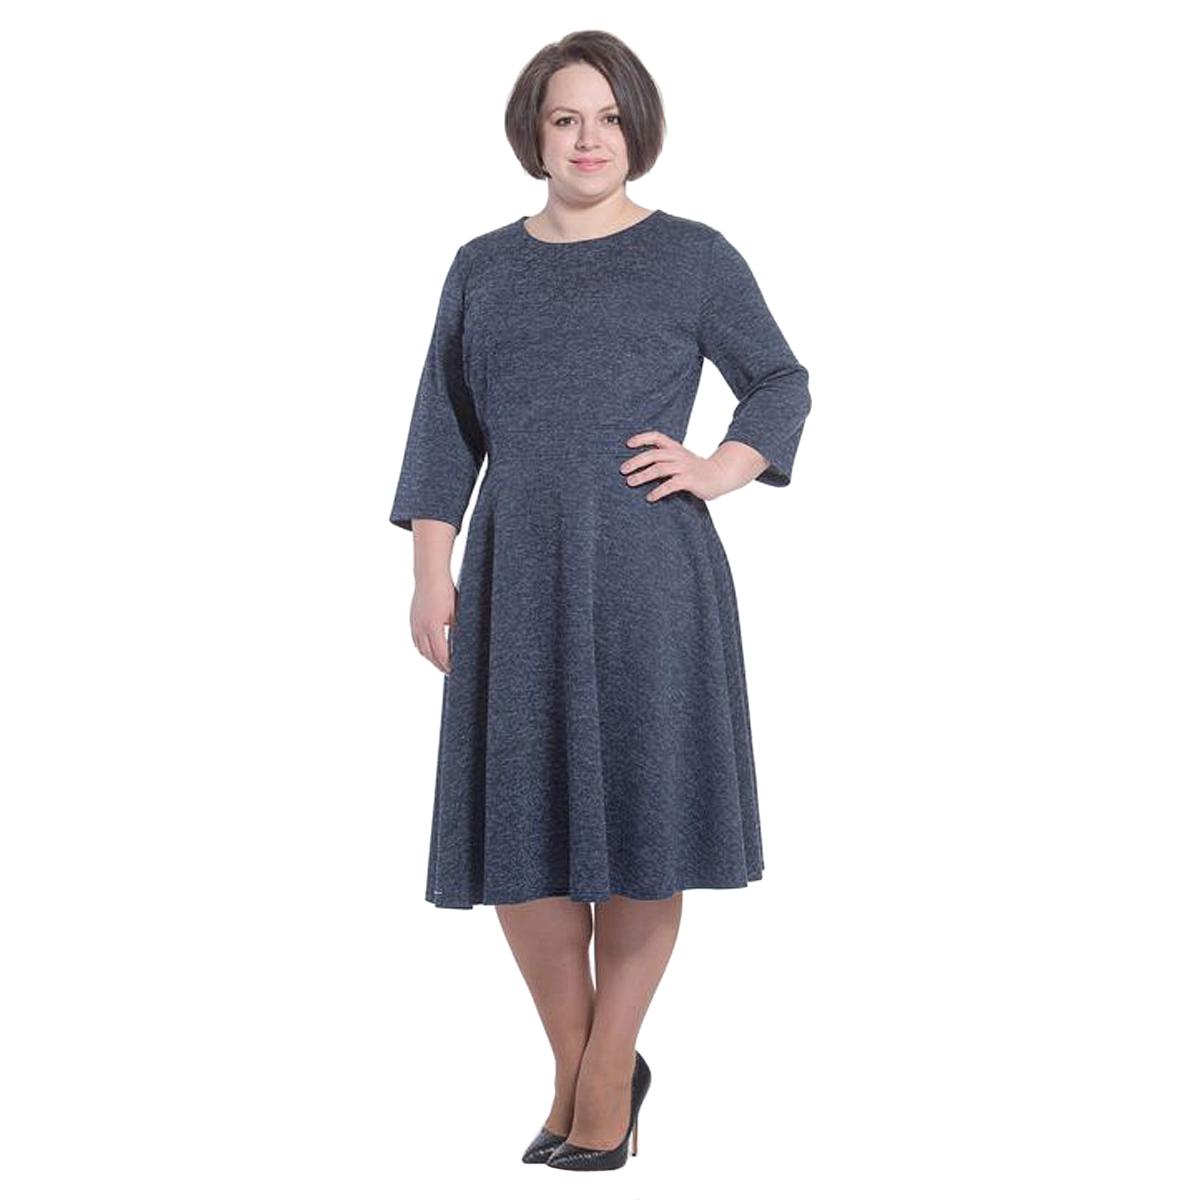 Платье KISLIS, 7250 УС